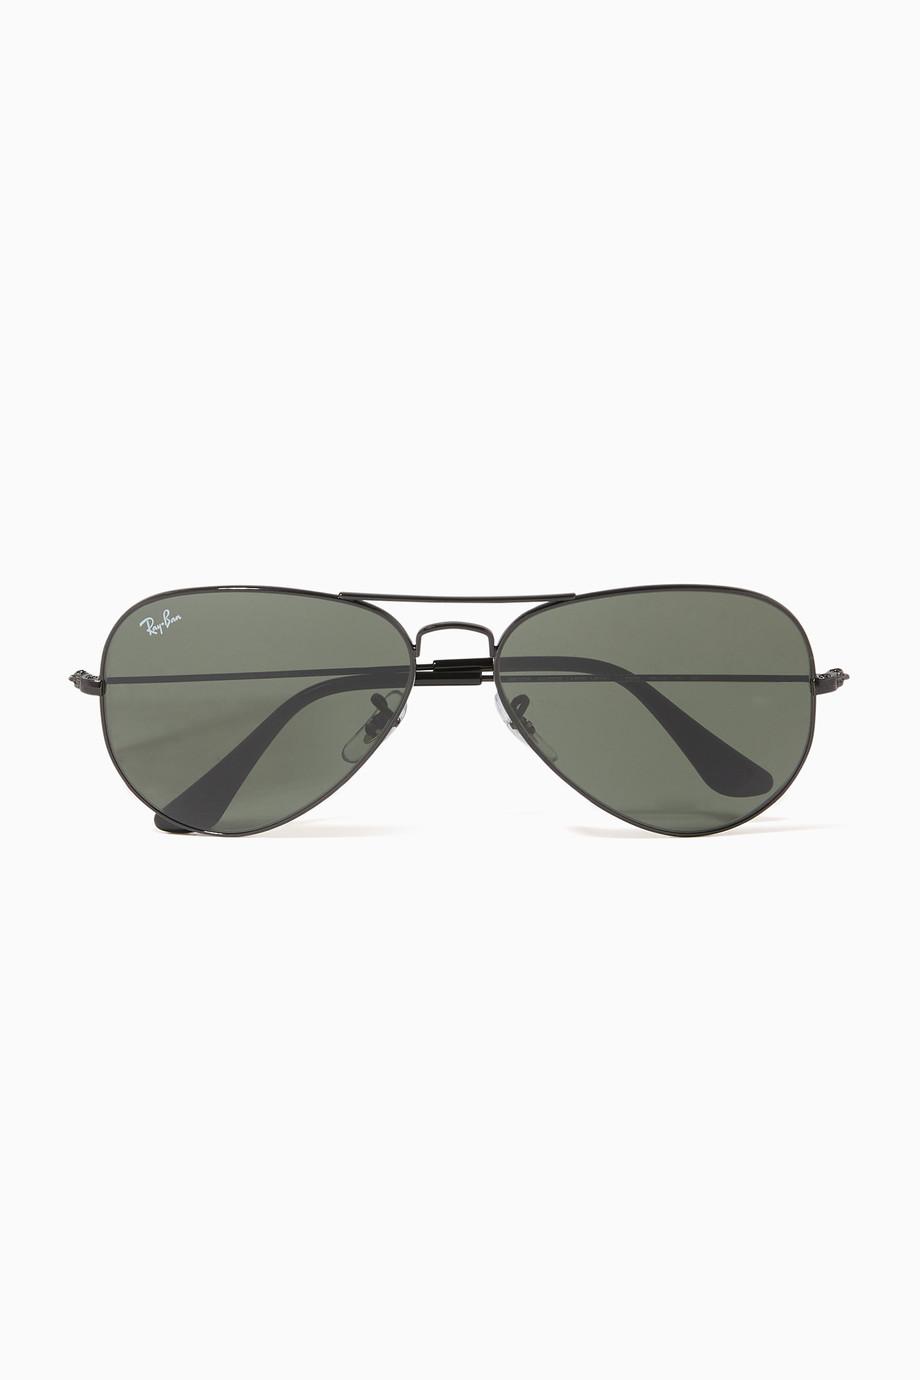 Shop Ray Ban Black Aviator Classic Sunglasses For Men Ounass